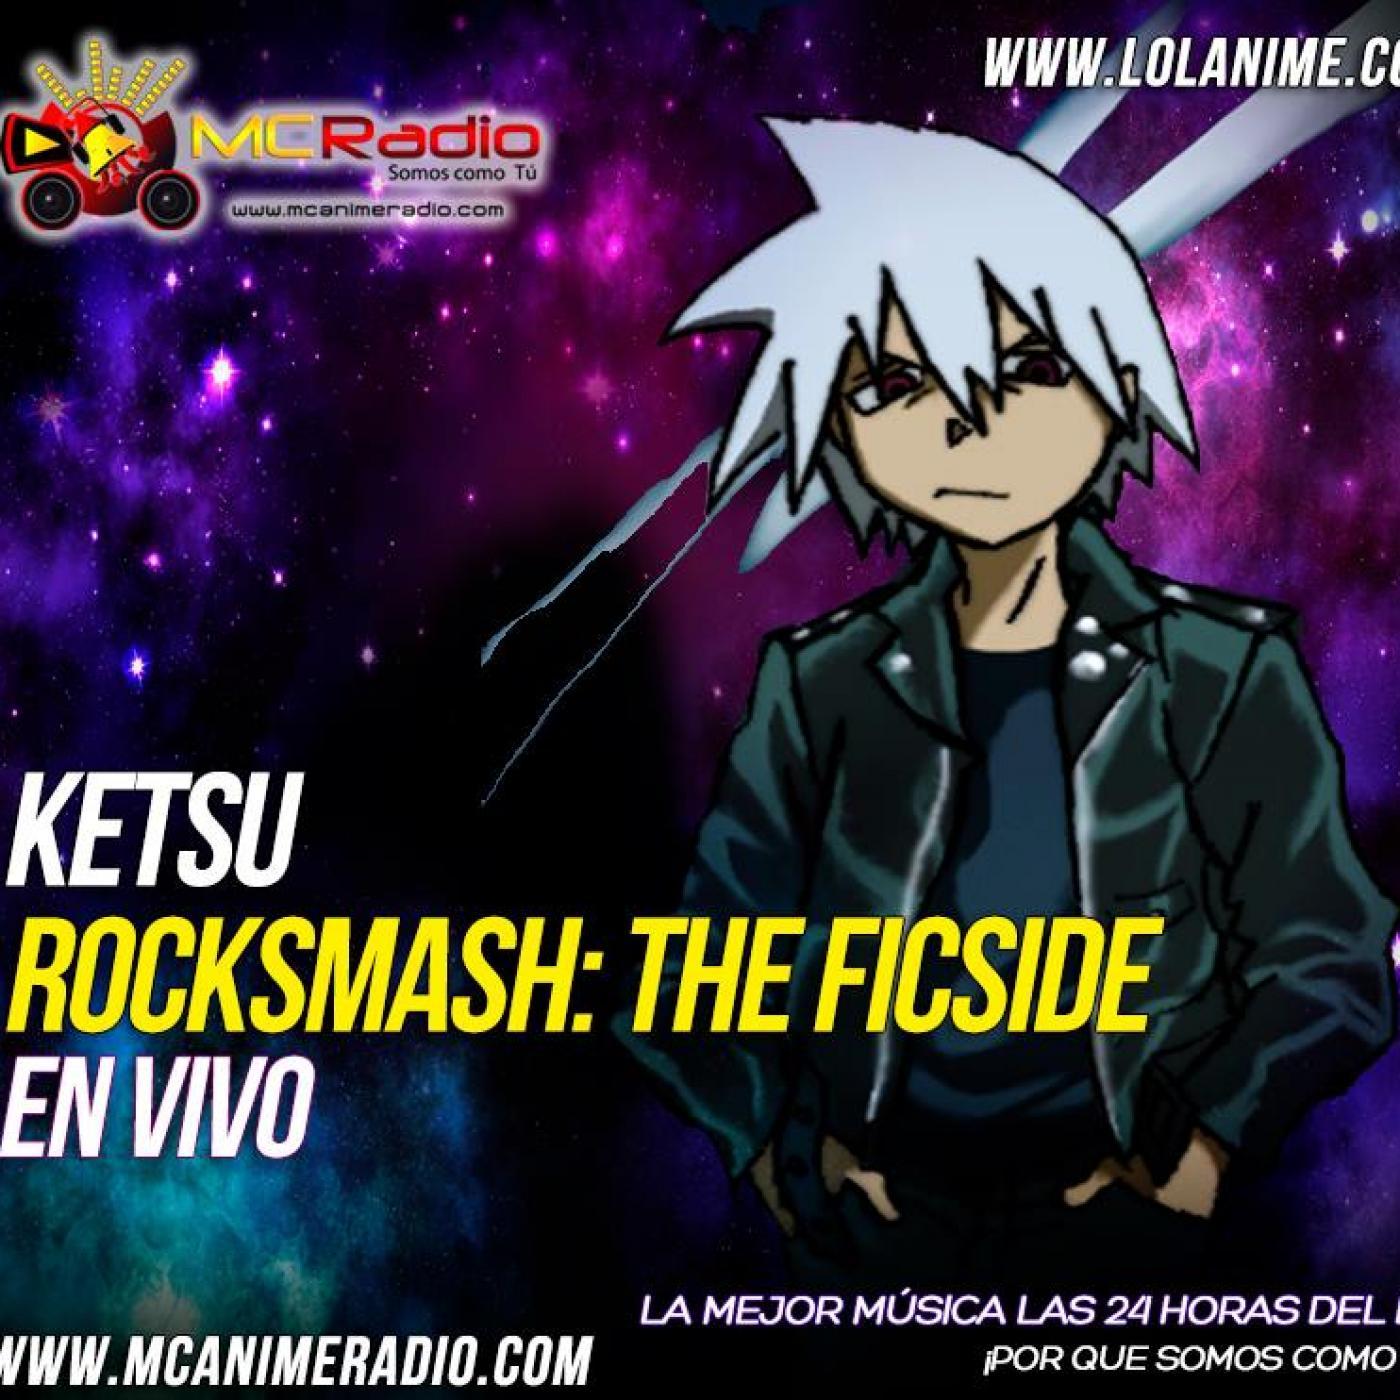 <![CDATA[RockSmash: The FicSide]]>